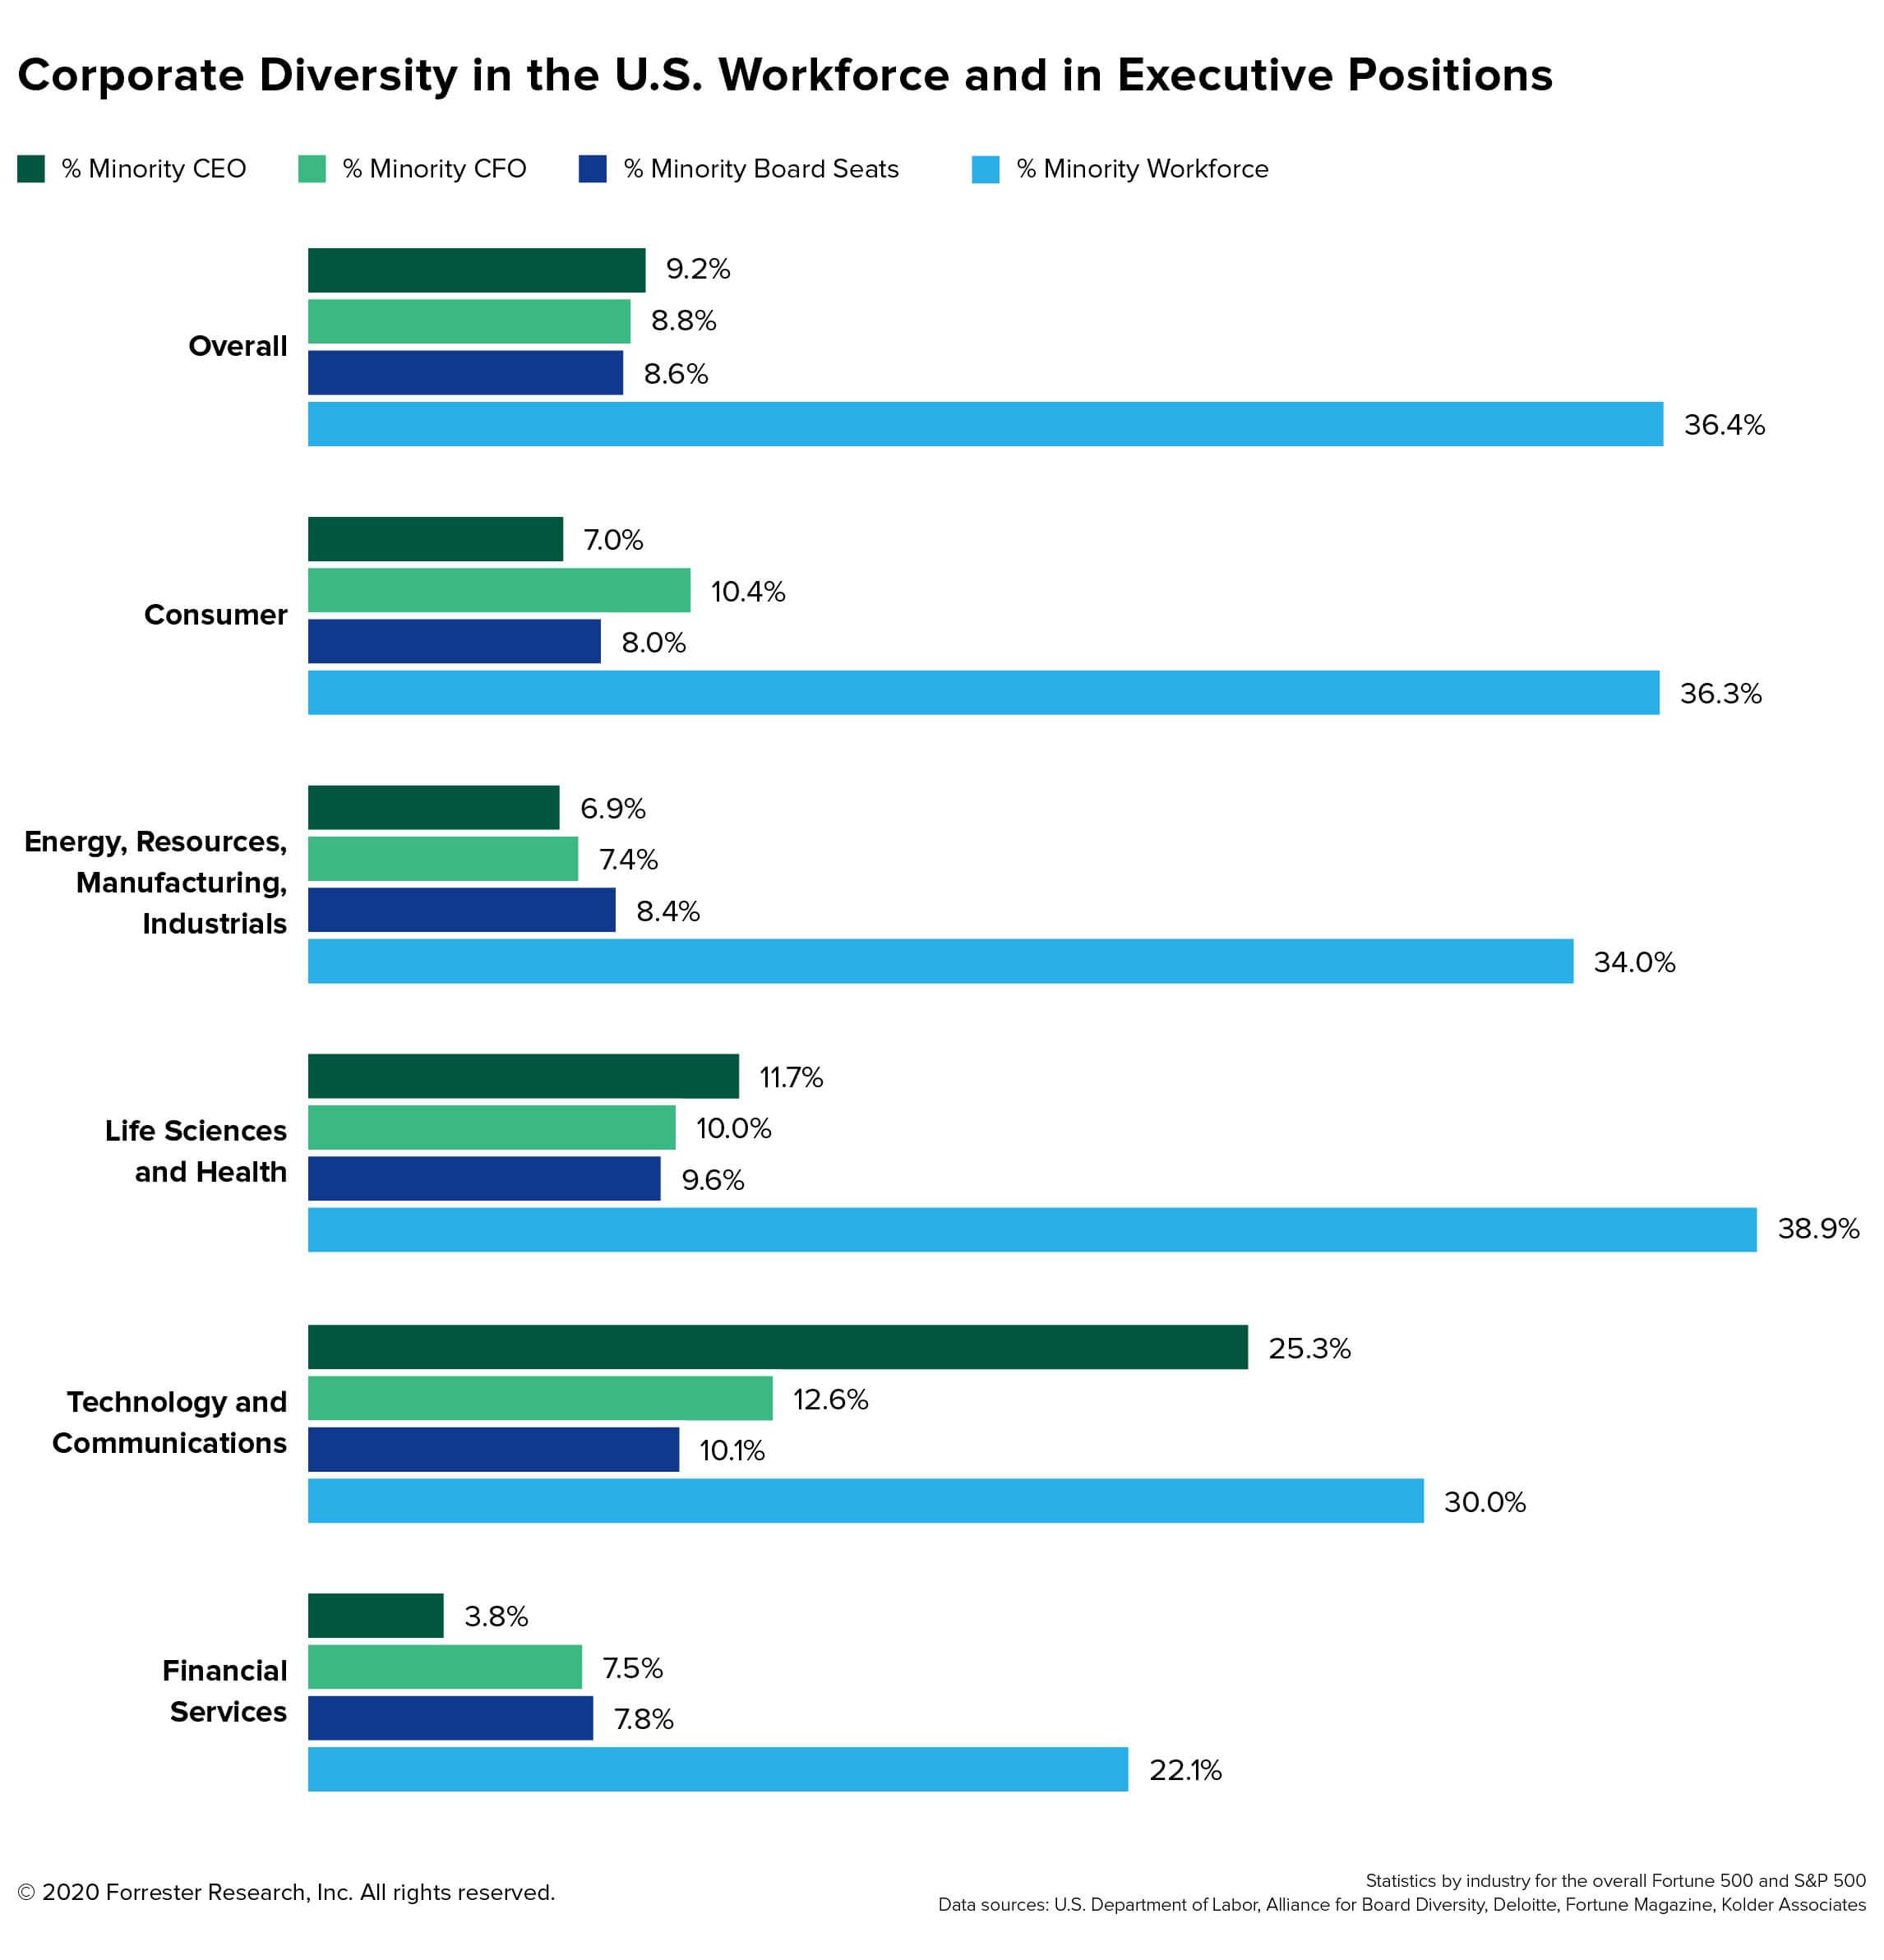 CorporateDiversityintheUSWorkforceandinExecutivePositions2020 2